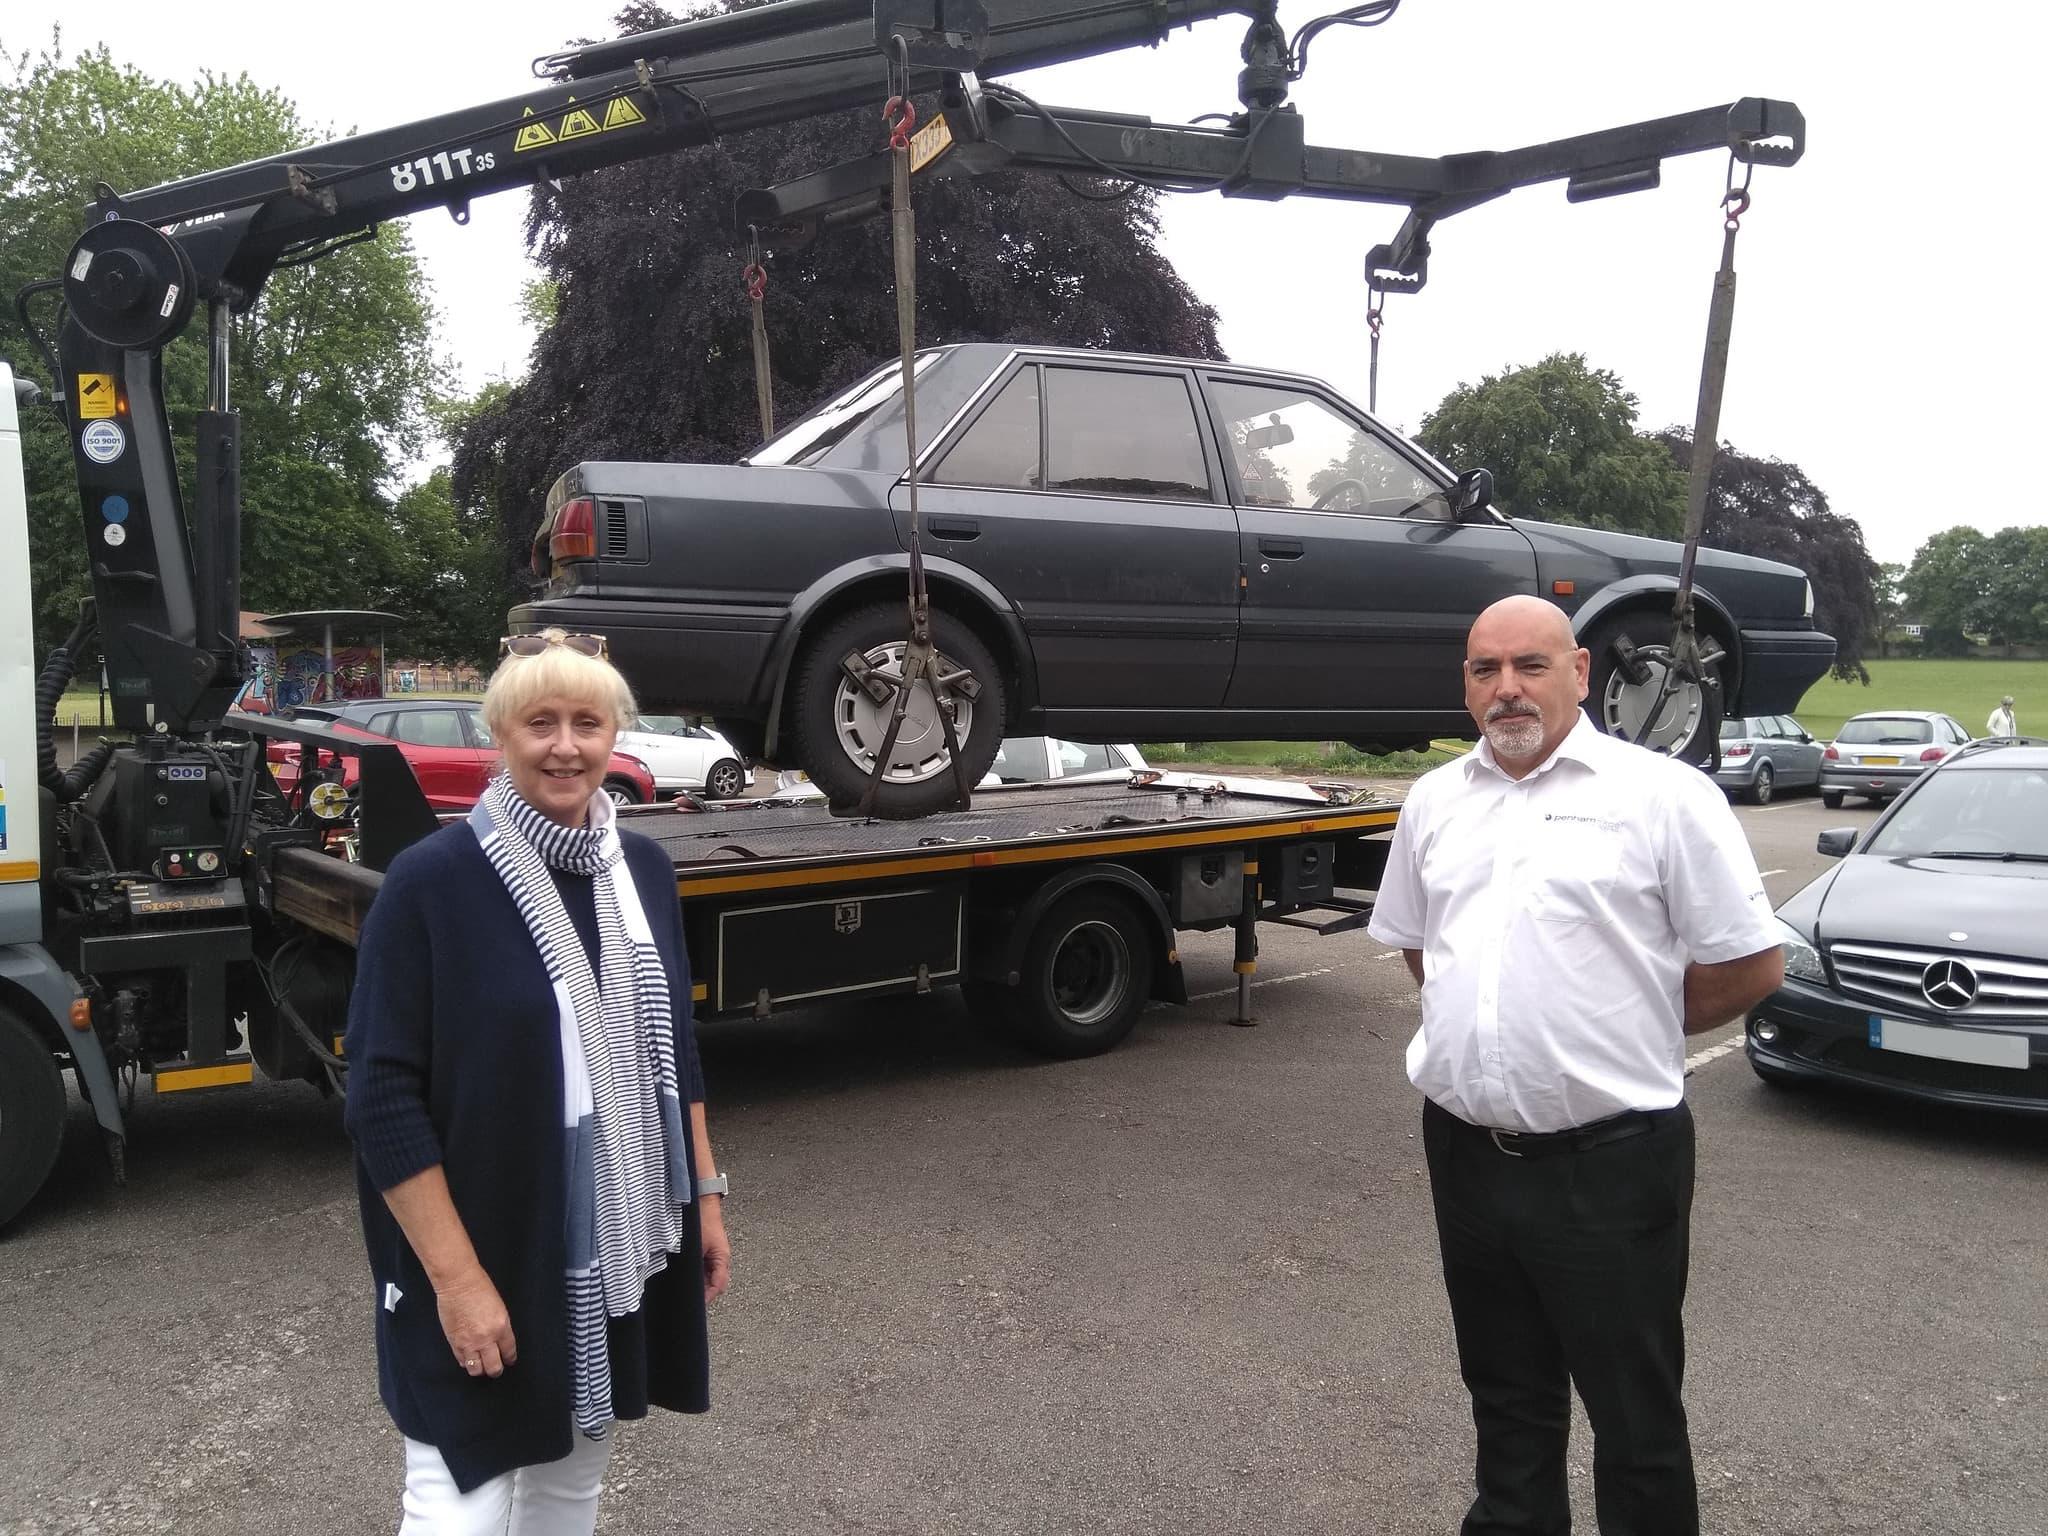 Penham help Dudley Council clamp down on untaxed vehicles - Penham Excel